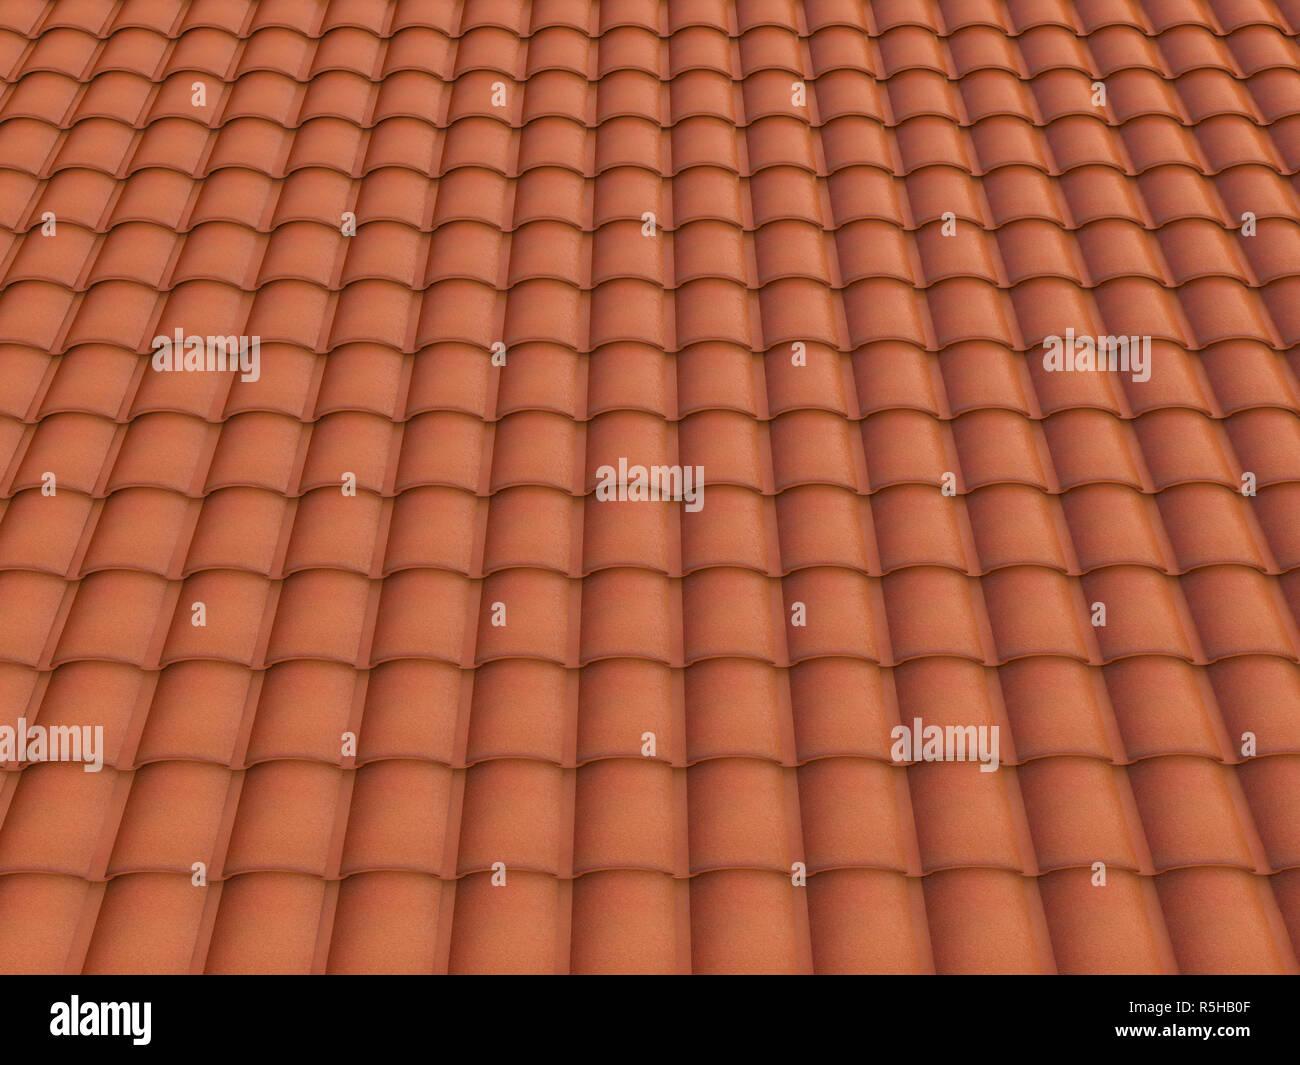 Spanish tiles - Stock Image